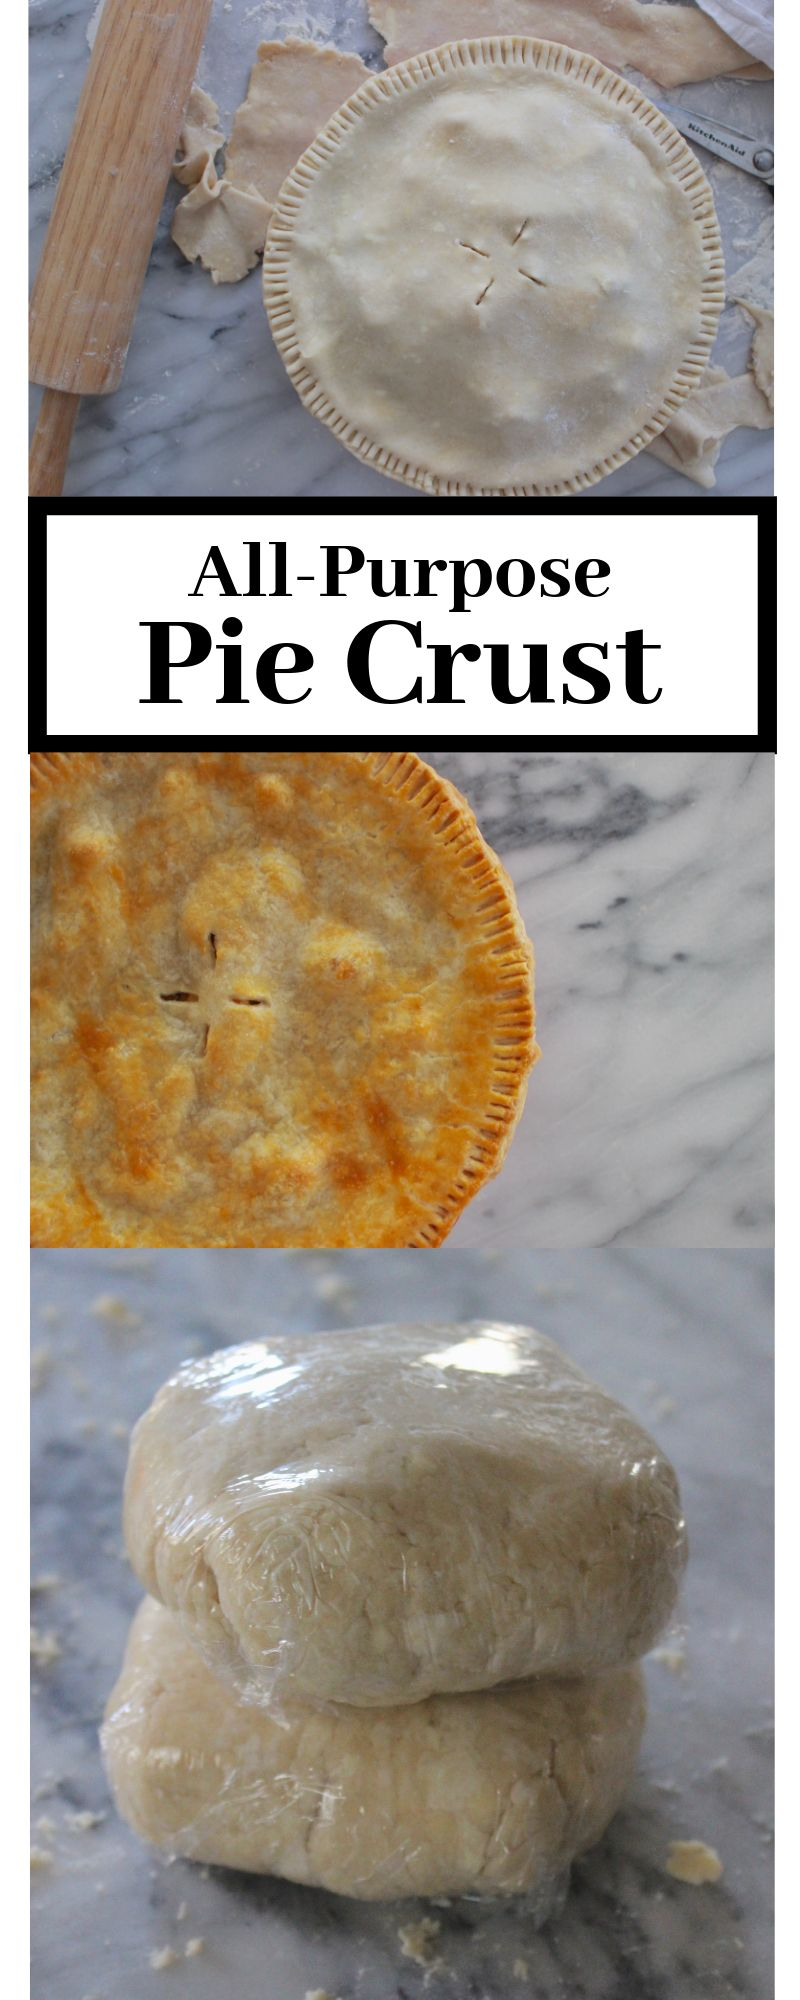 All-Purpose Pie Crust